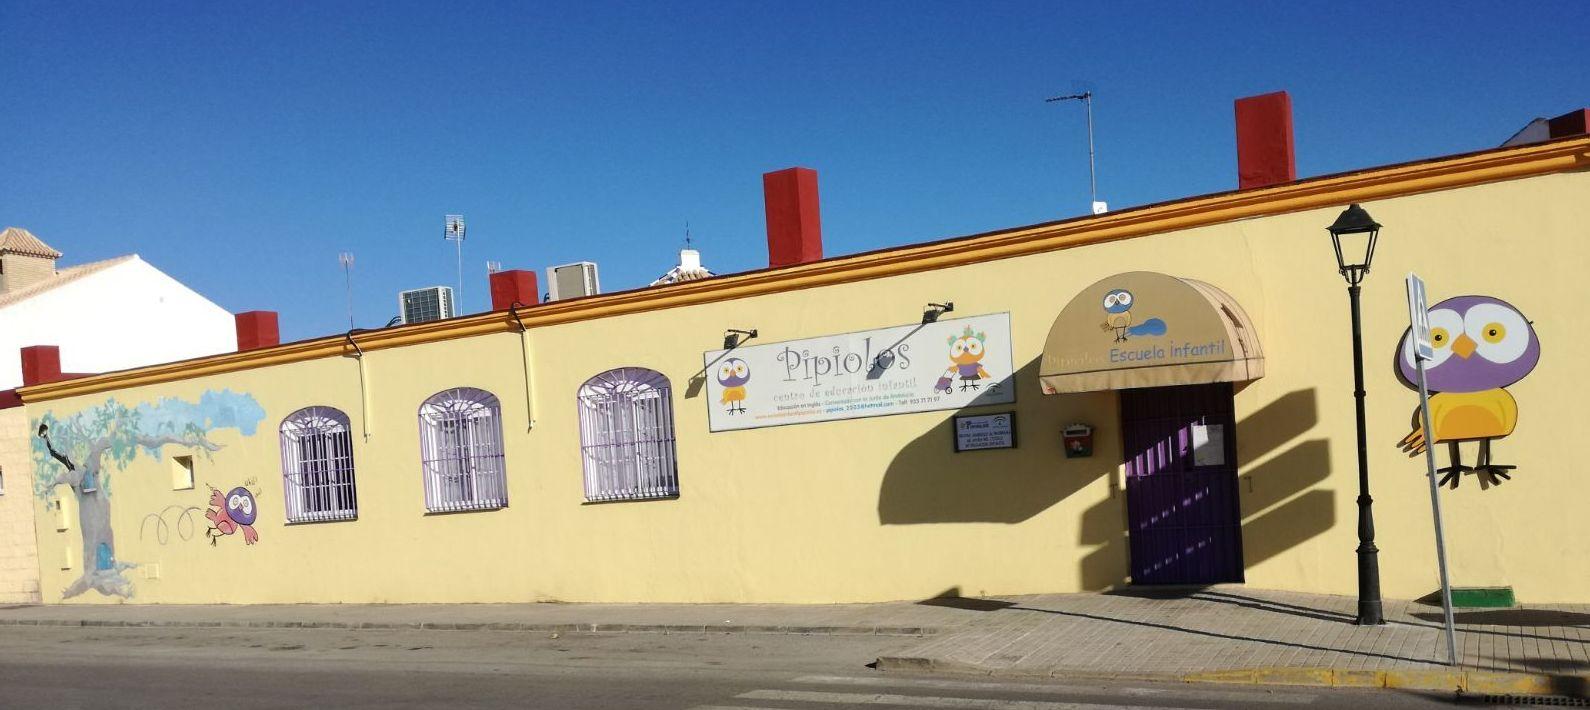 Foto 11 de Escuelas infantiles en Umbrete | Pipiolos Escuela Infantil